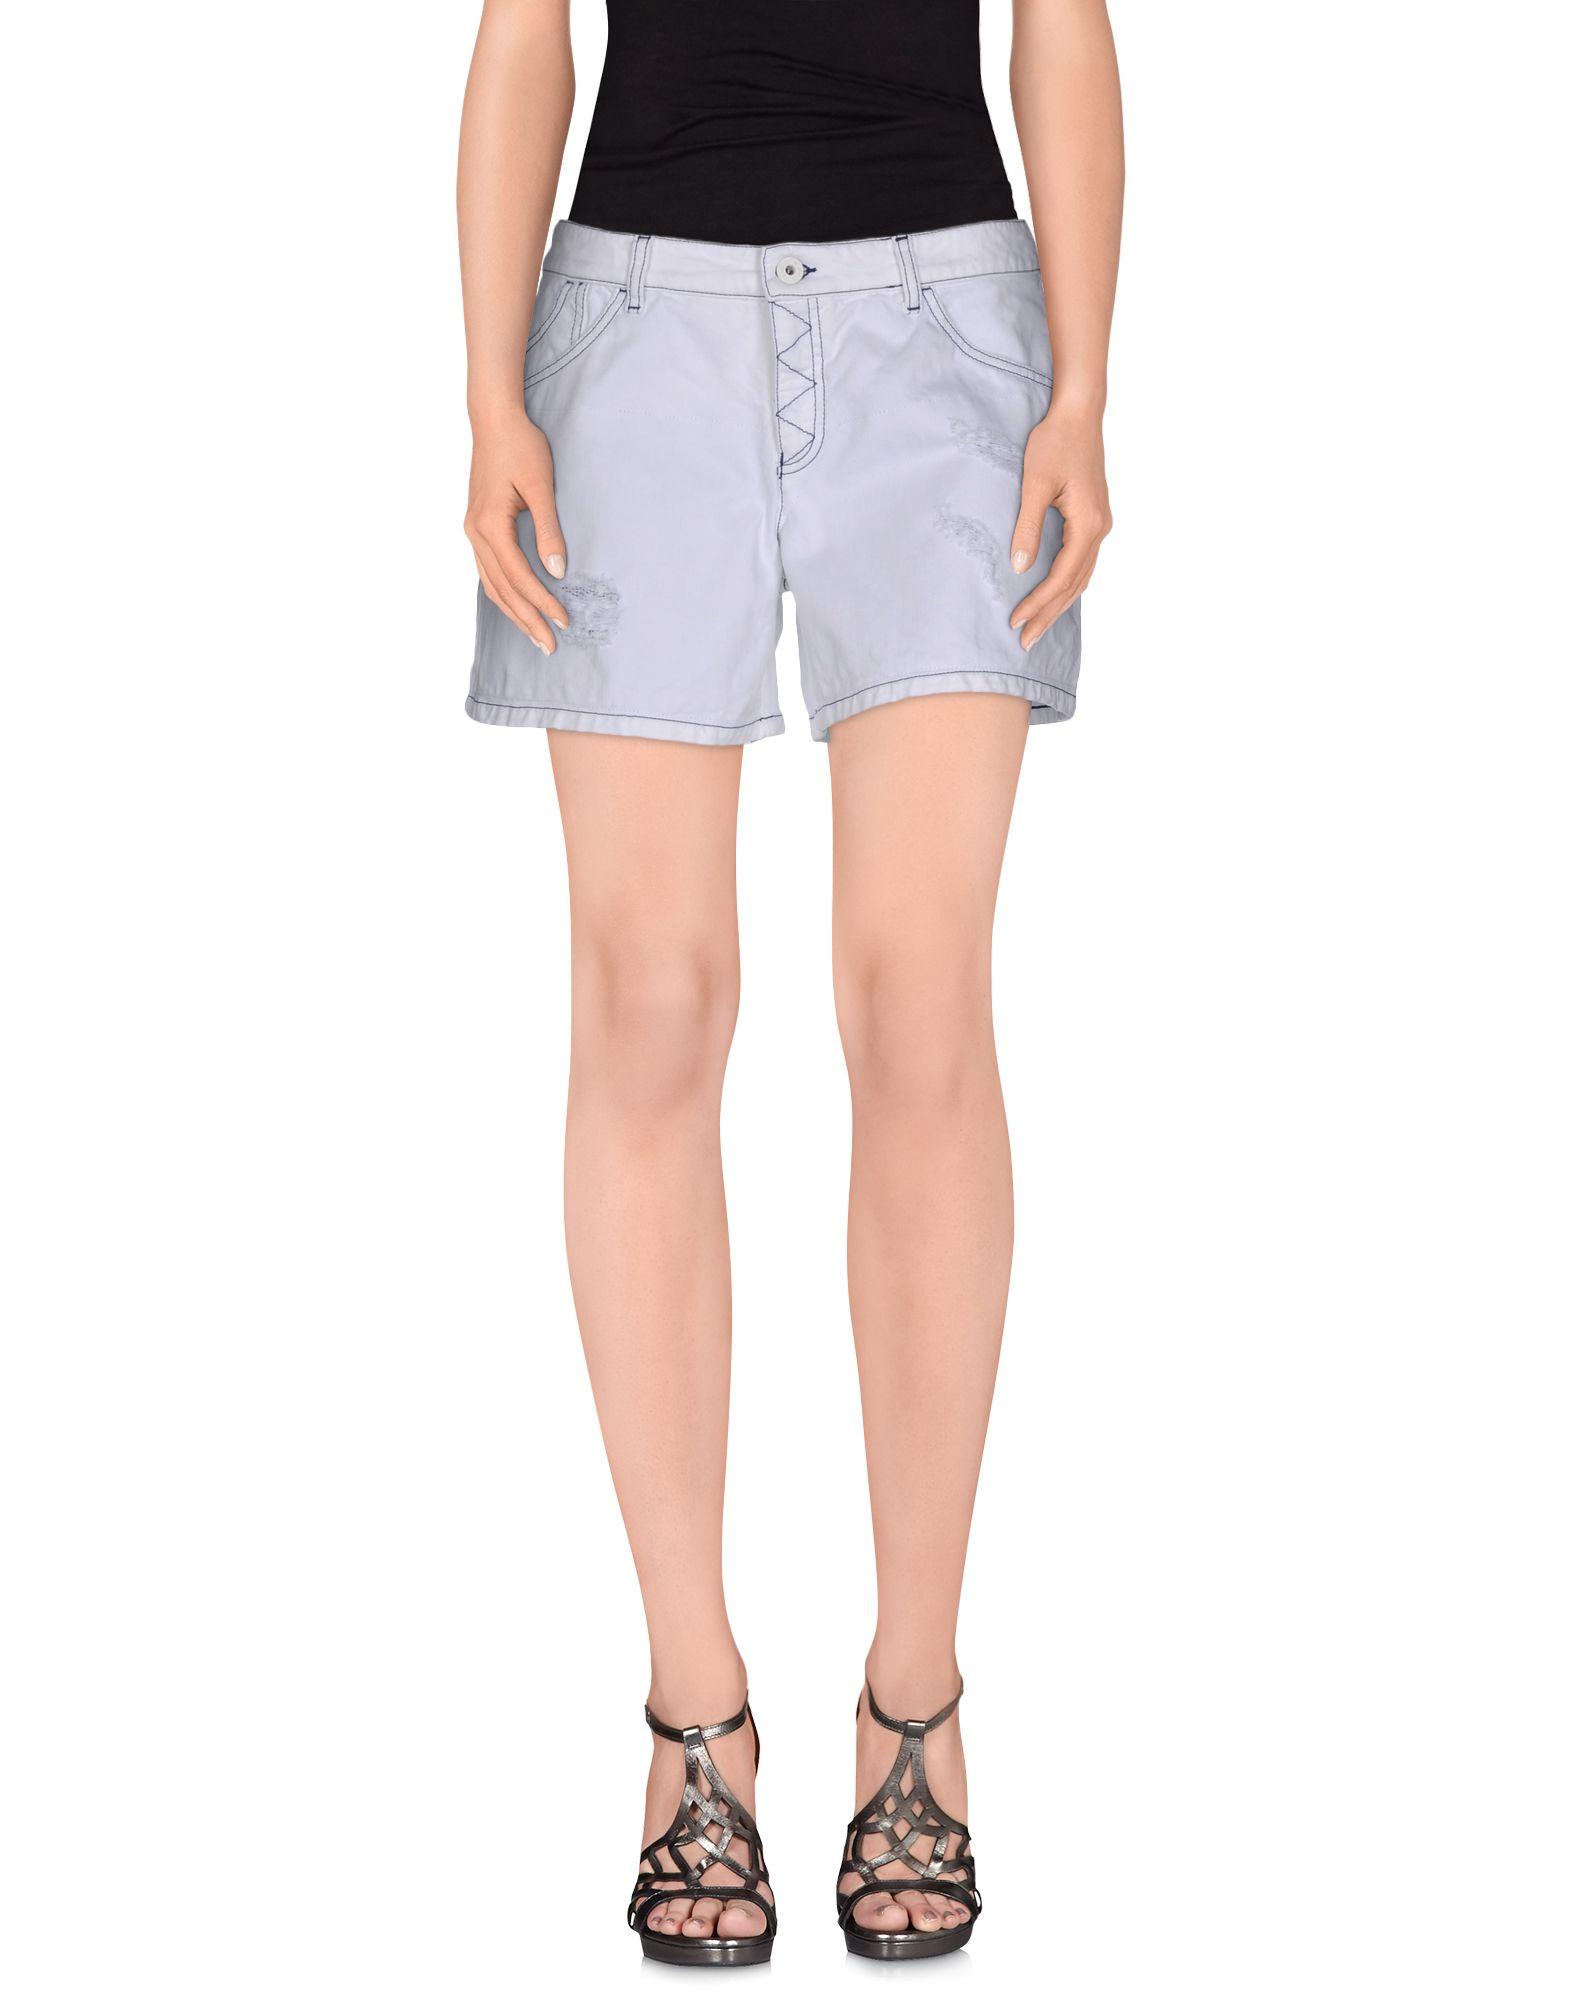 Emporio armani Denim Shorts in White | Lyst